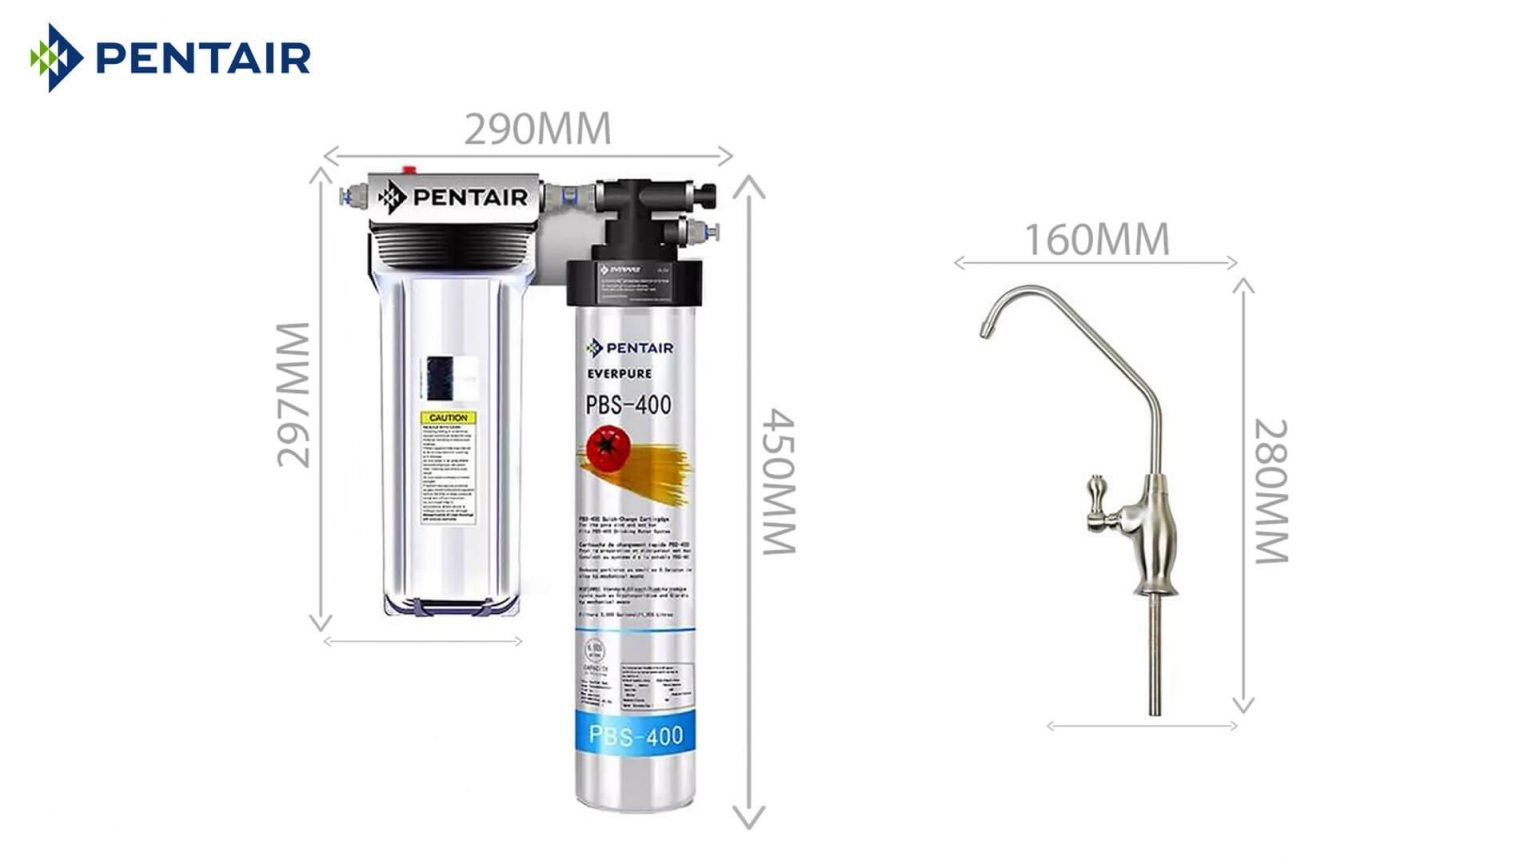 Máy lọc nước Pentair Everpure PBS-400 Standard - 2